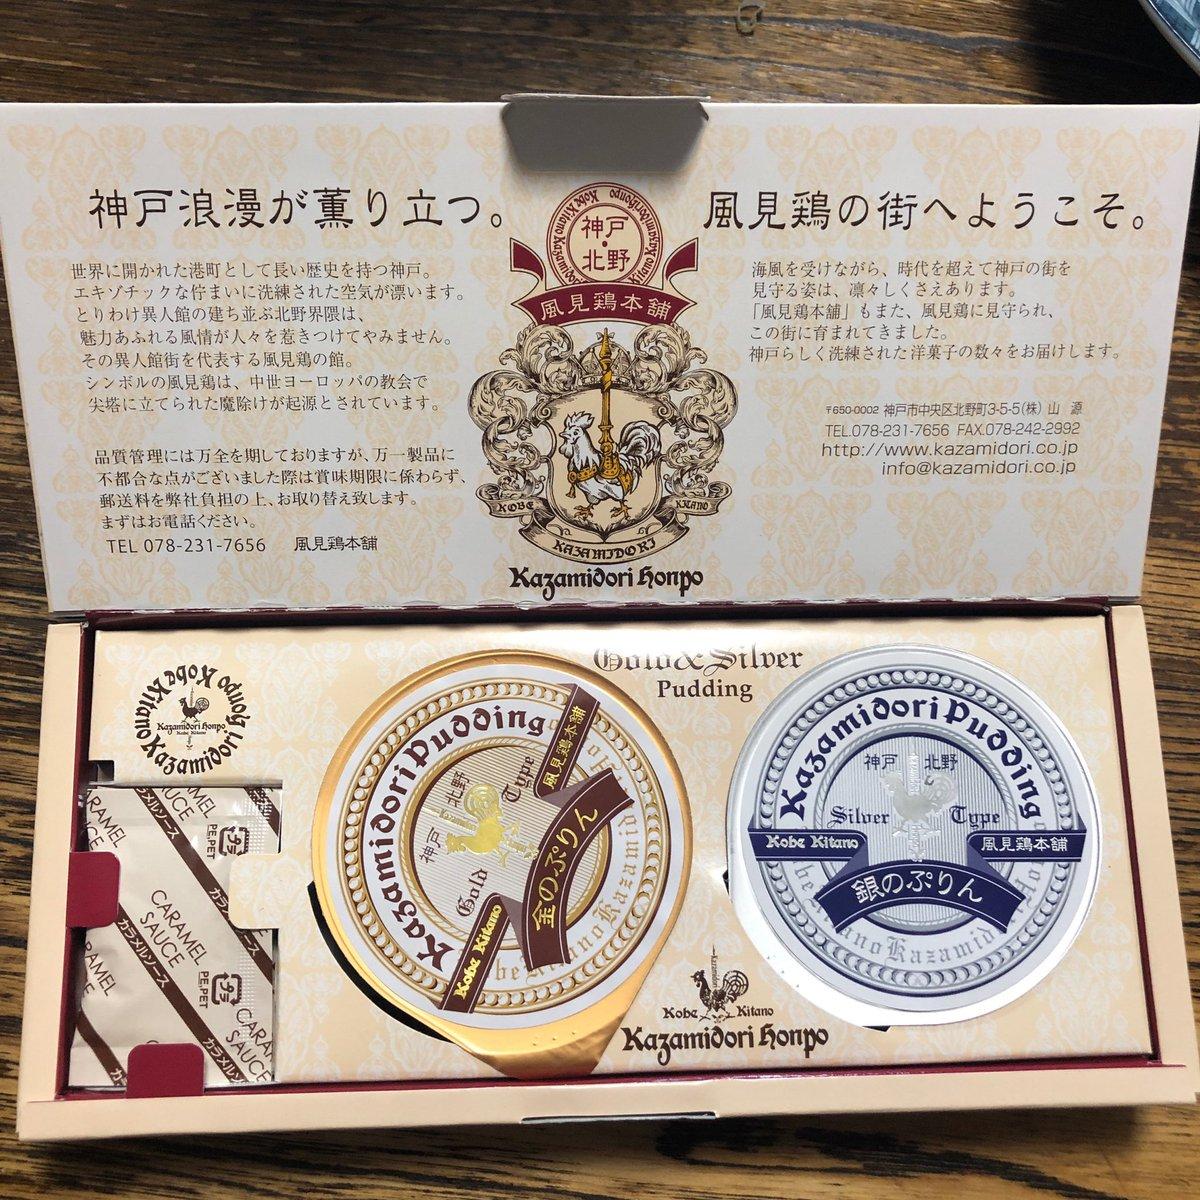 test ツイッターメディア - 神戸で買ったプリン食べる https://t.co/YsXg7G4R2f